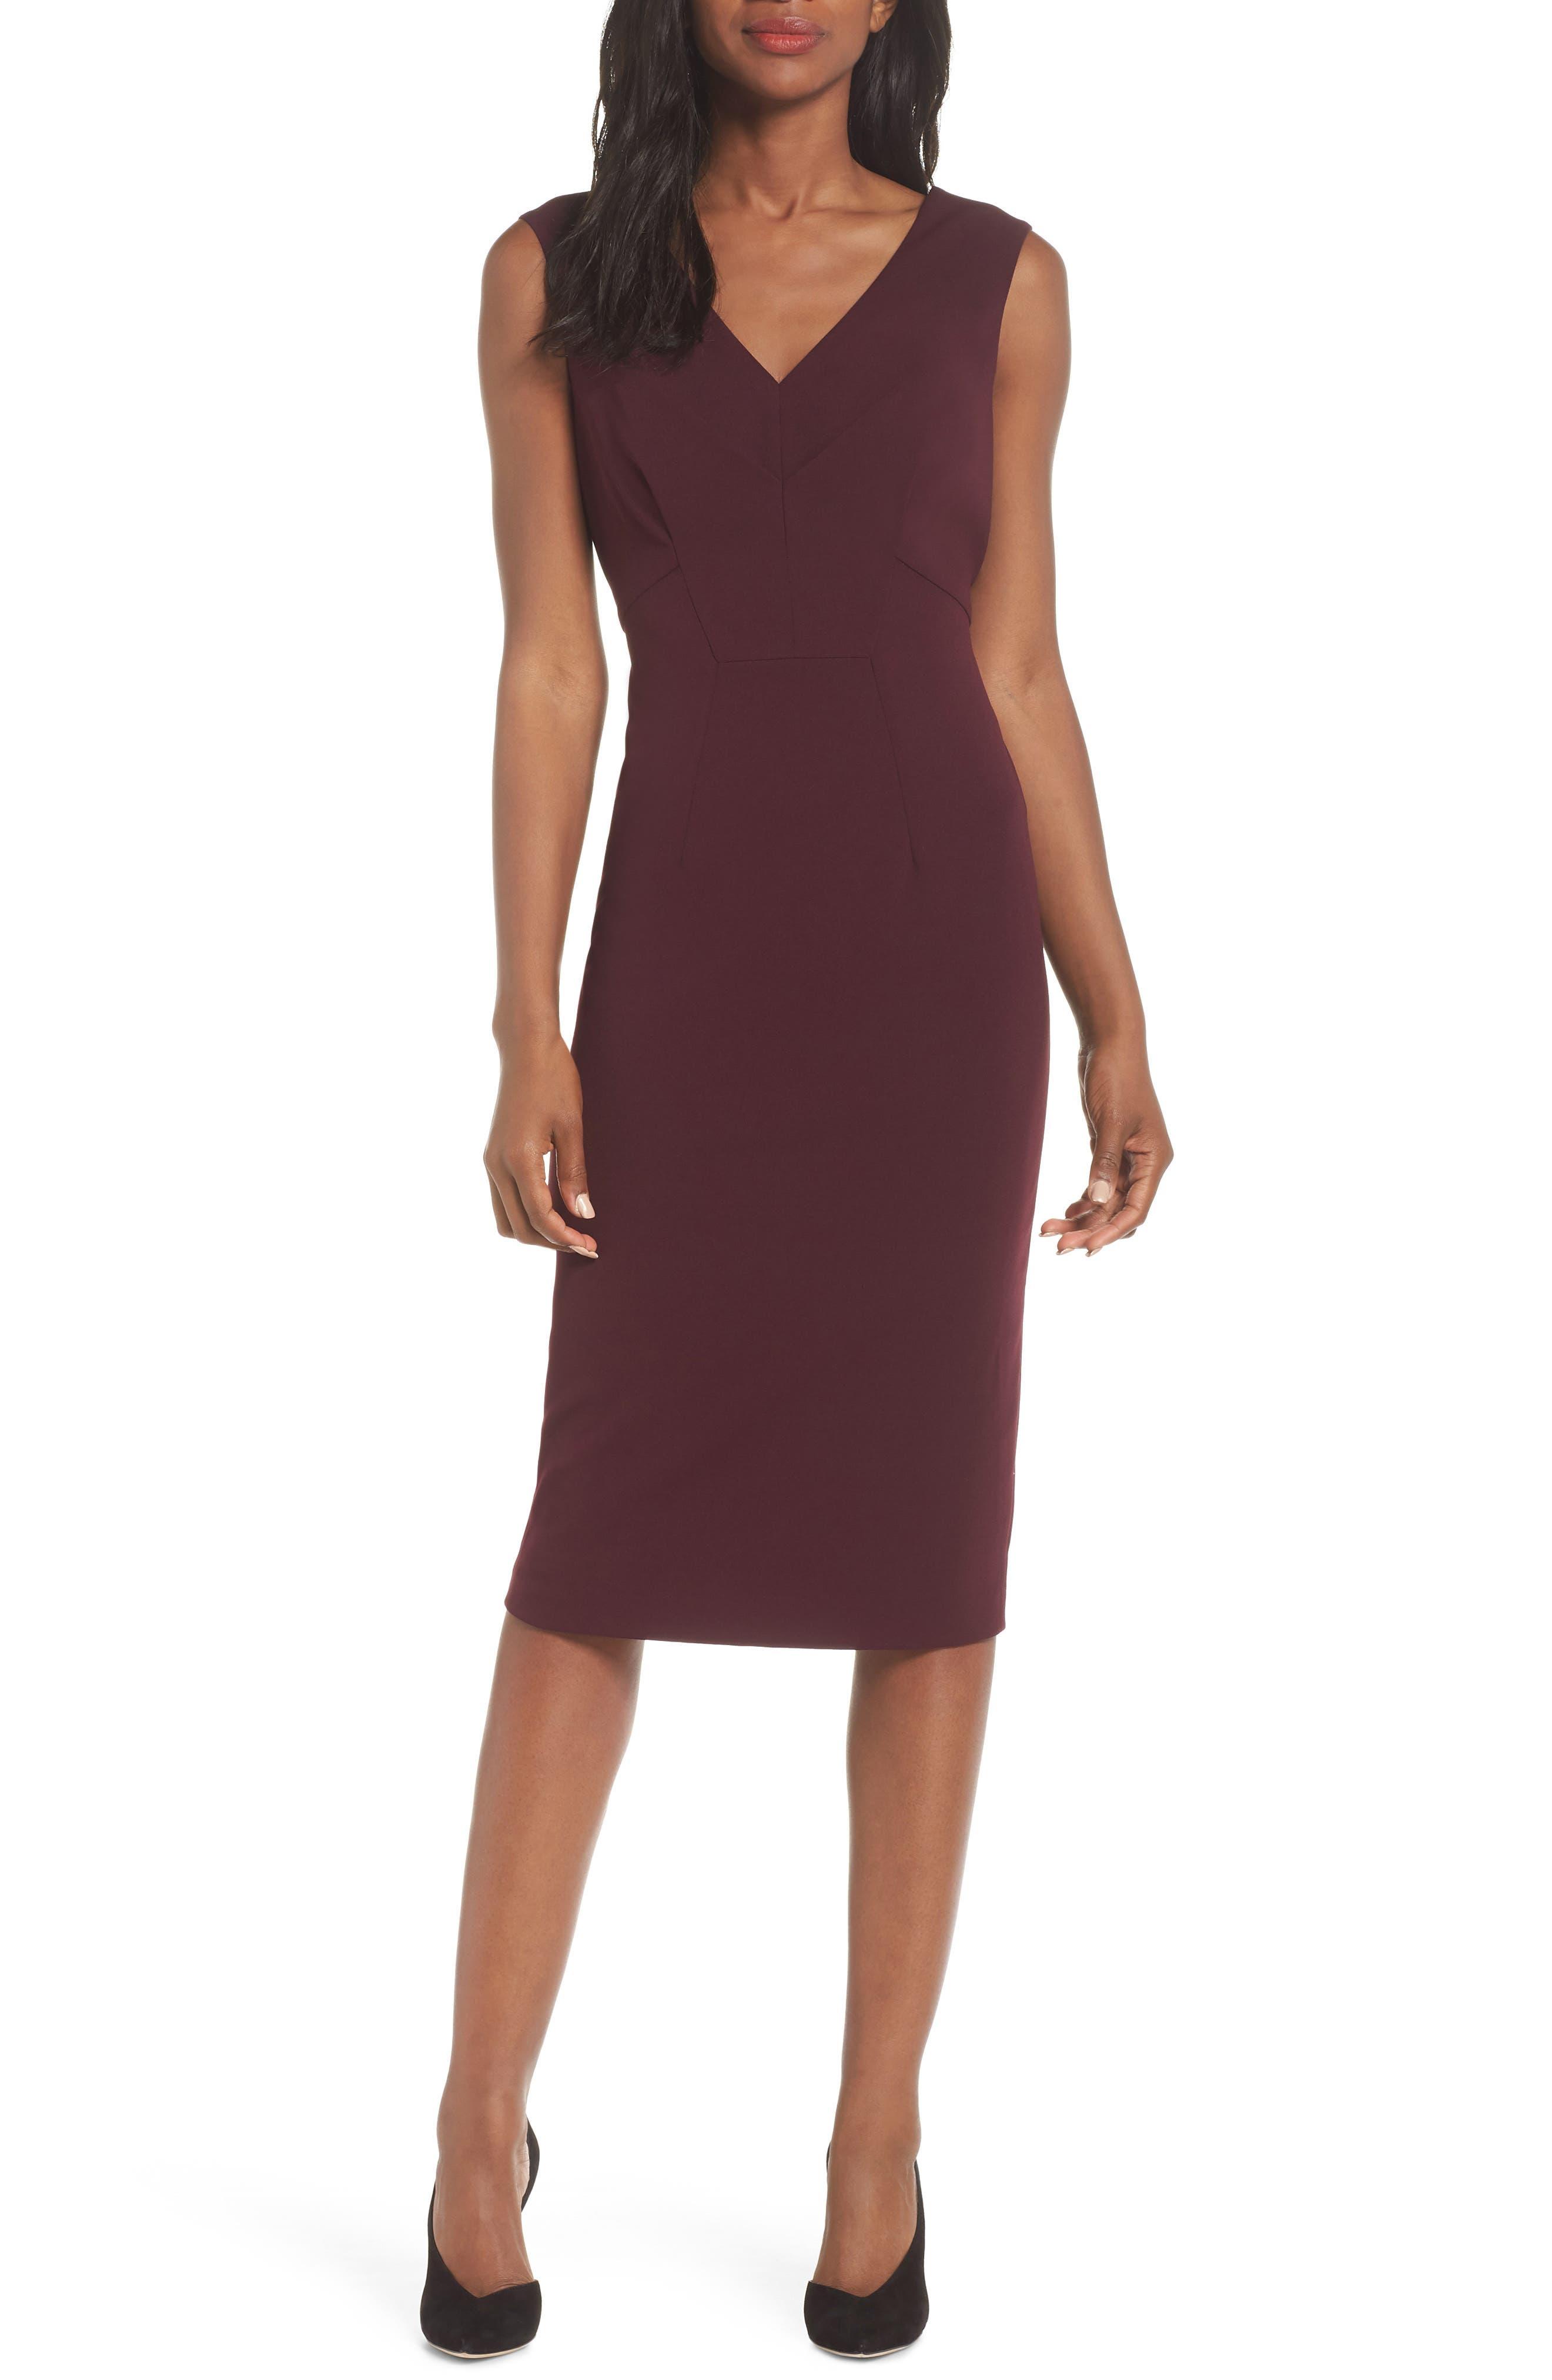 Ava Gardner Sheath Dress,                             Main thumbnail 1, color,                             930